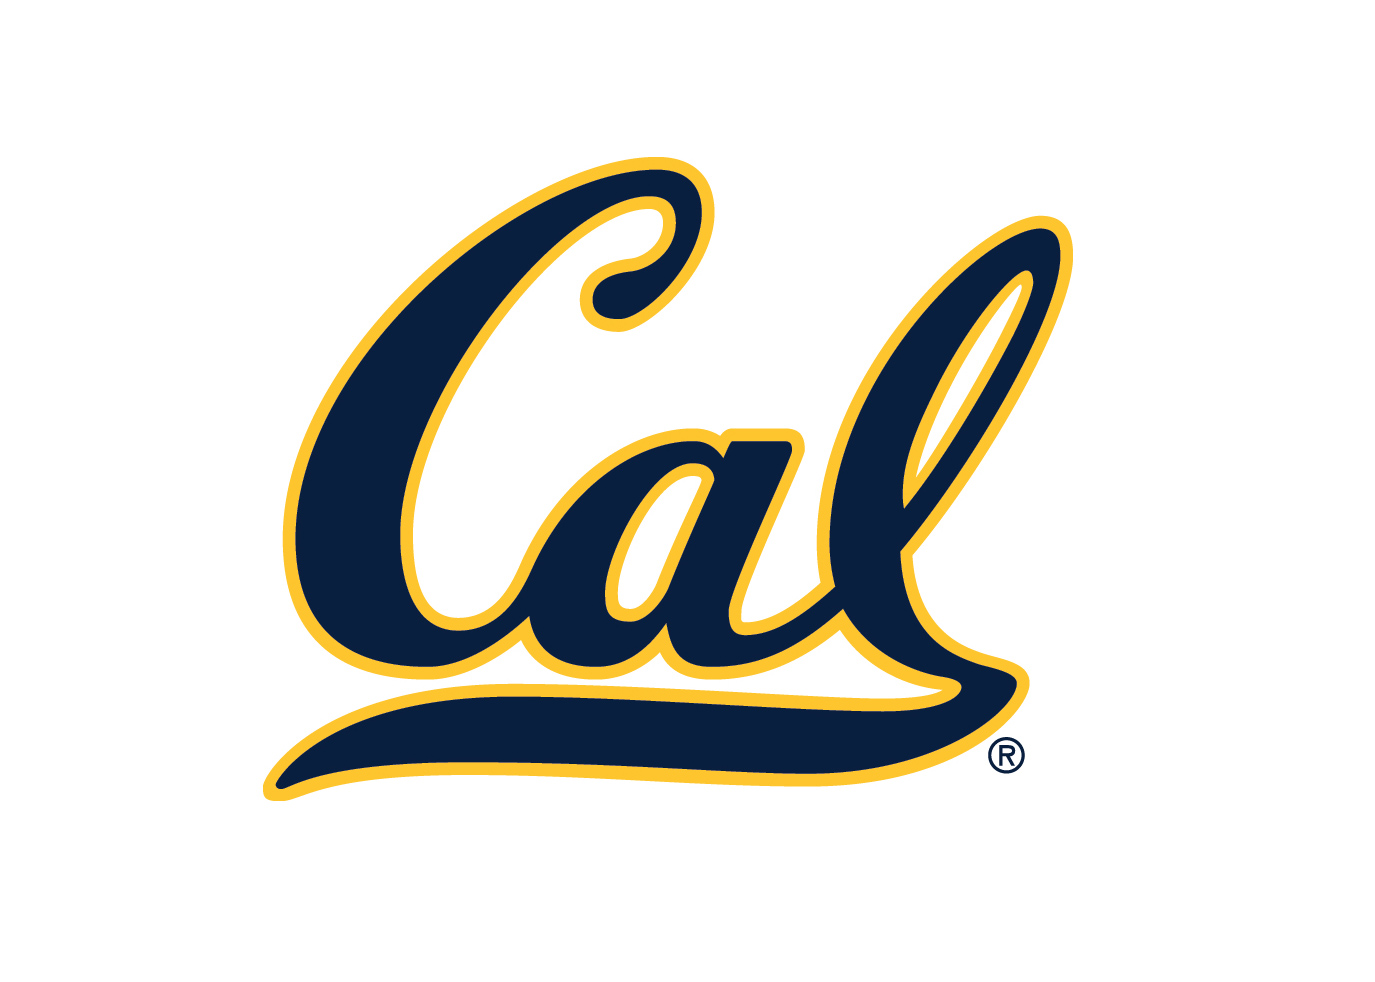 cal athletics unveils updated brand identity for golden bears nike rh news nike com nike basketball logo wallpaper nike basketball logo designs